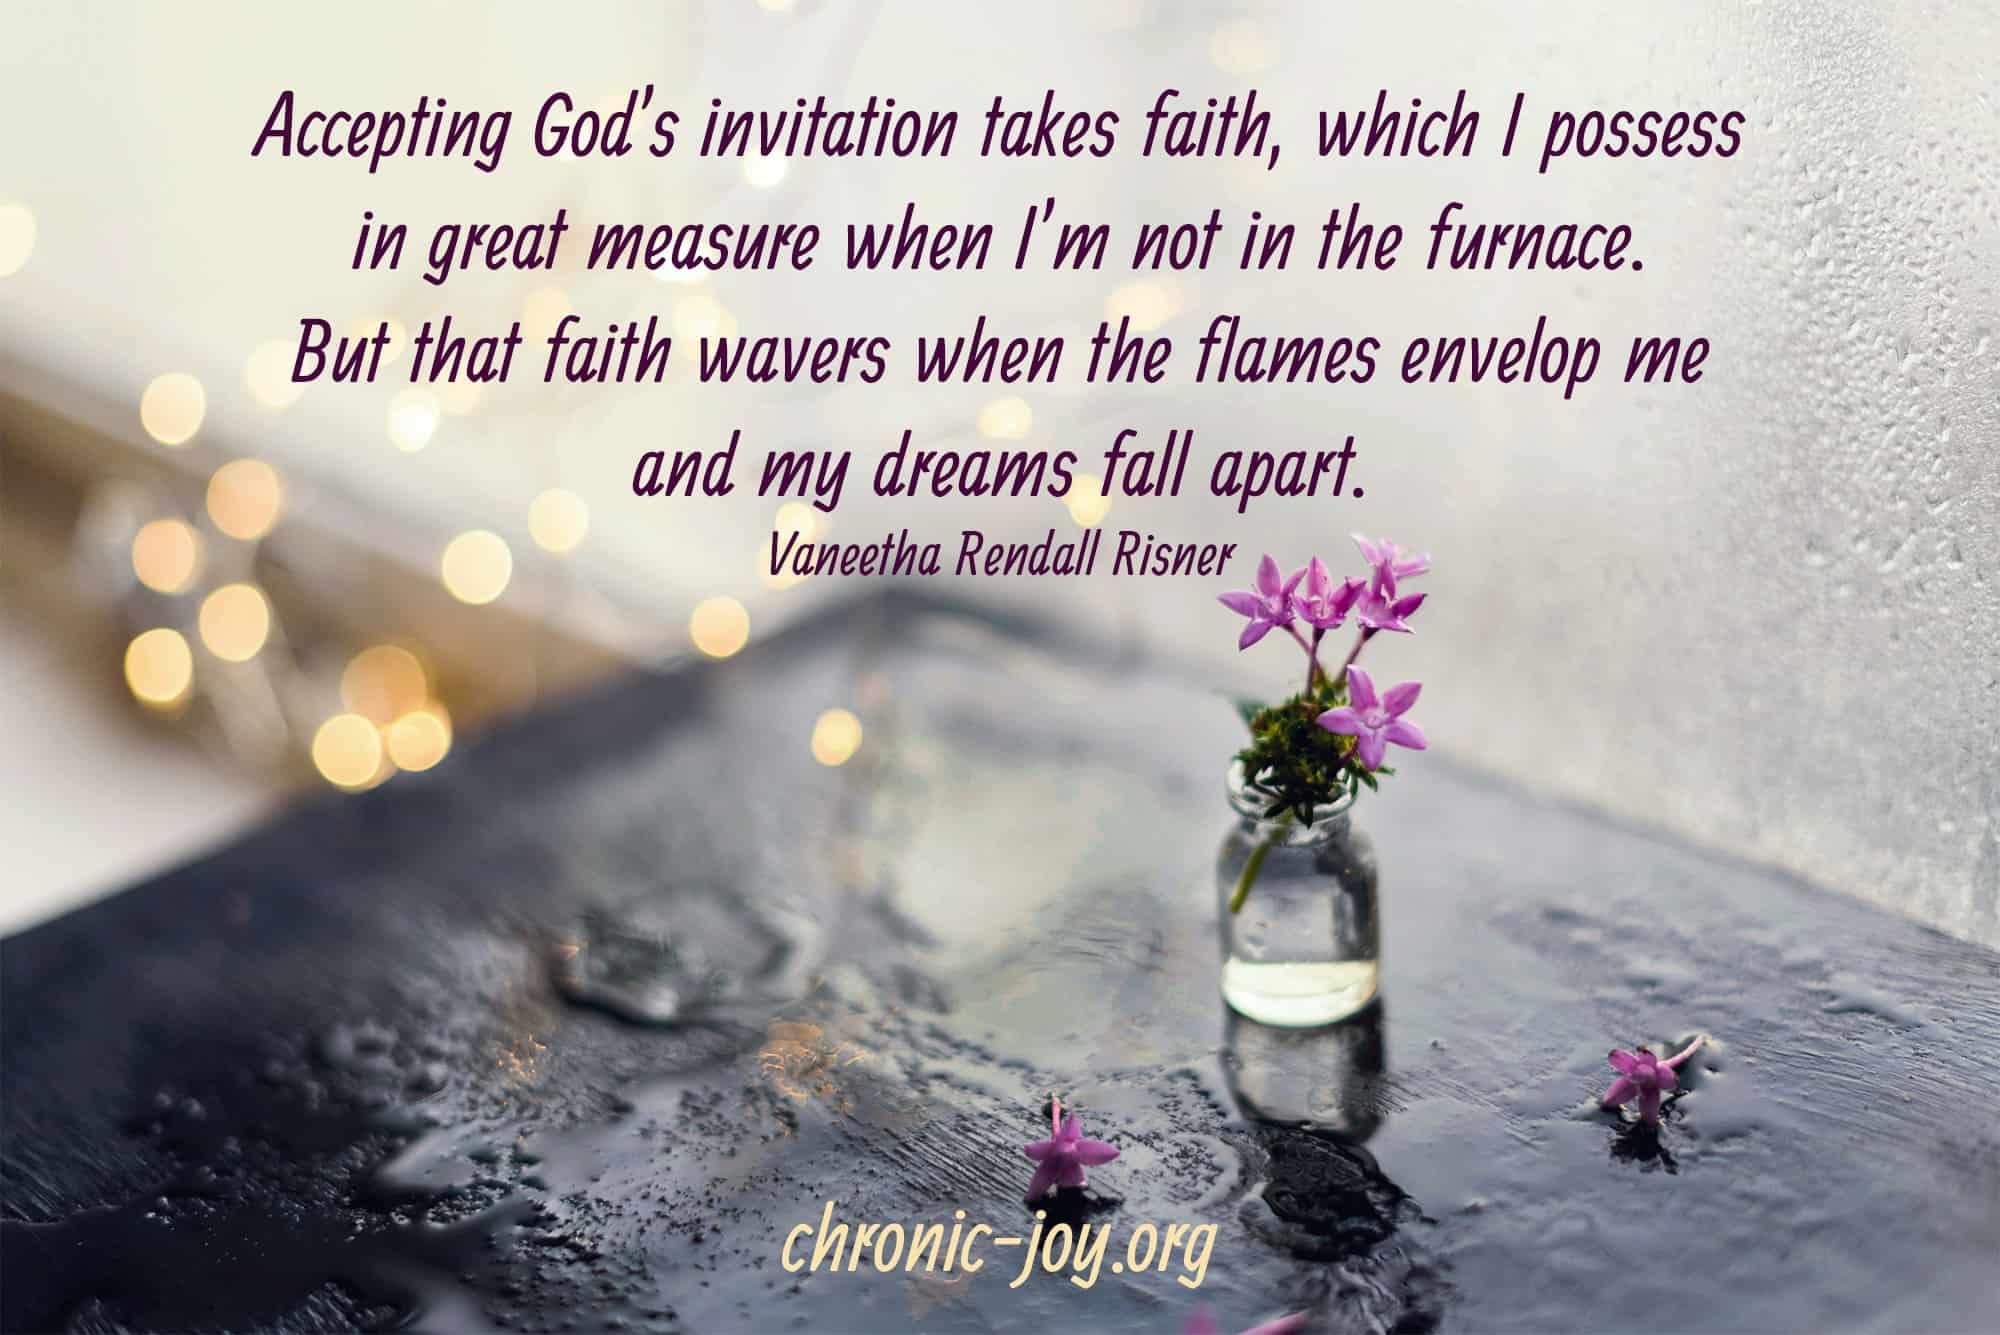 Accepting God's invitation takes faith.